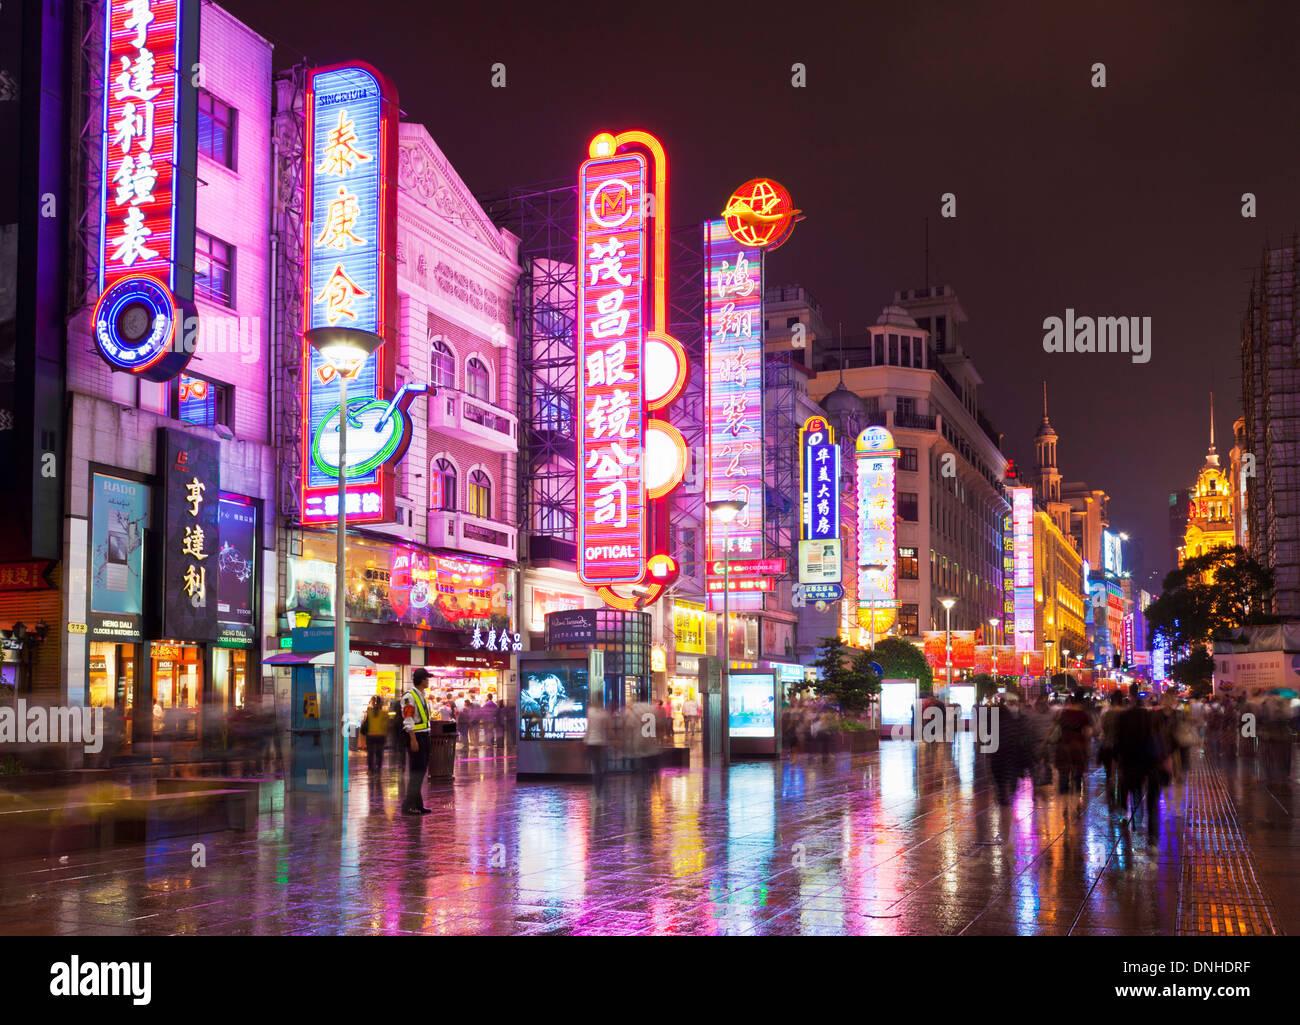 Nanjing Road East street, Shanghai Street City Einkaufszentrum Peoples Republic Of China, VR China, Asien Stockbild